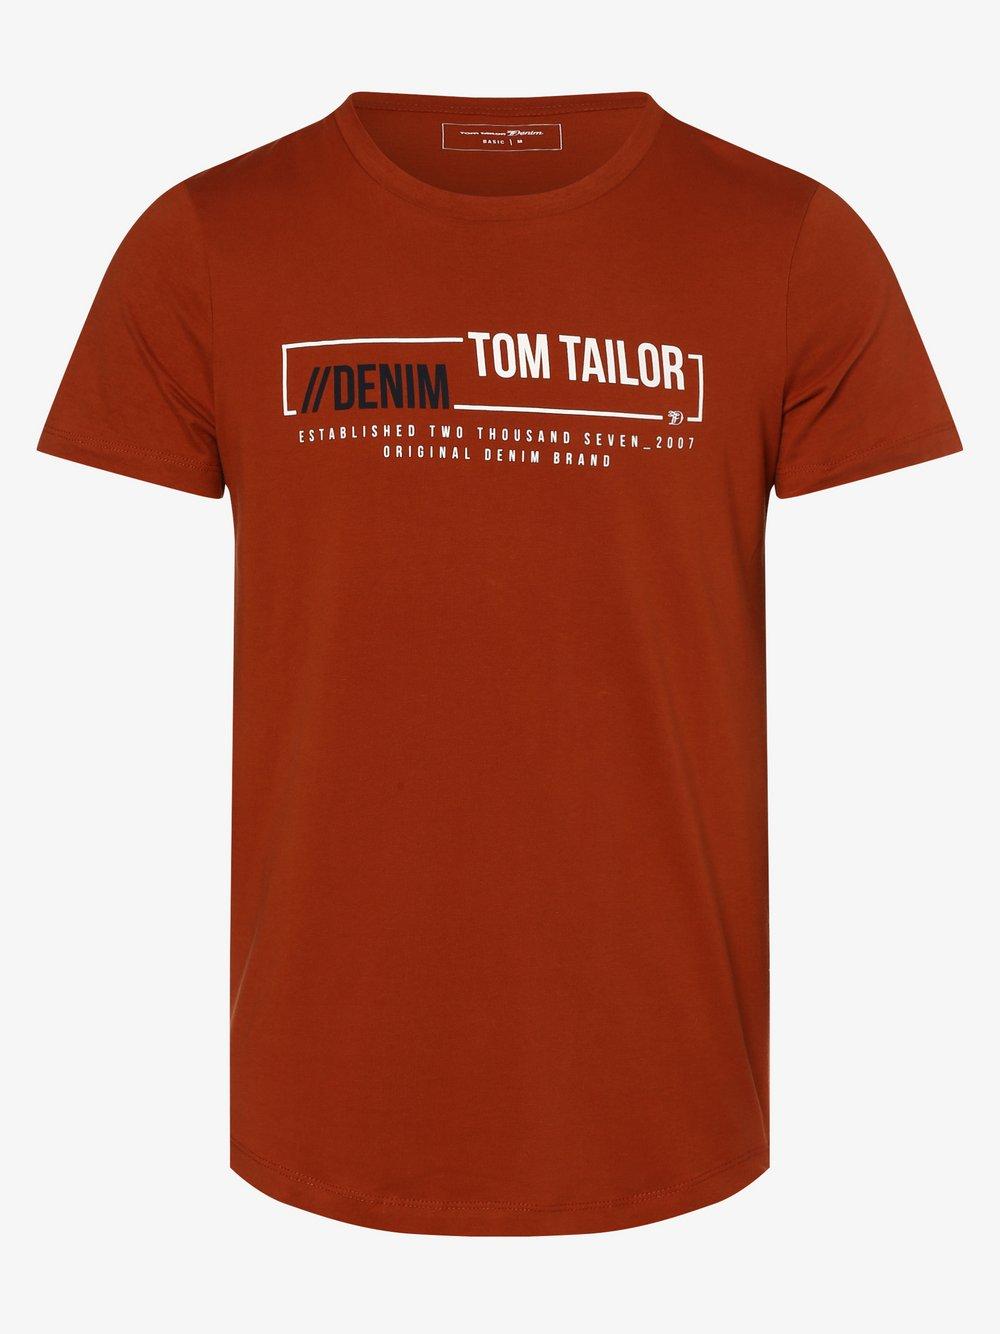 Tom Tailor – T-shirt męski, pomarańczowy Van Graaf 498403-0003-09940